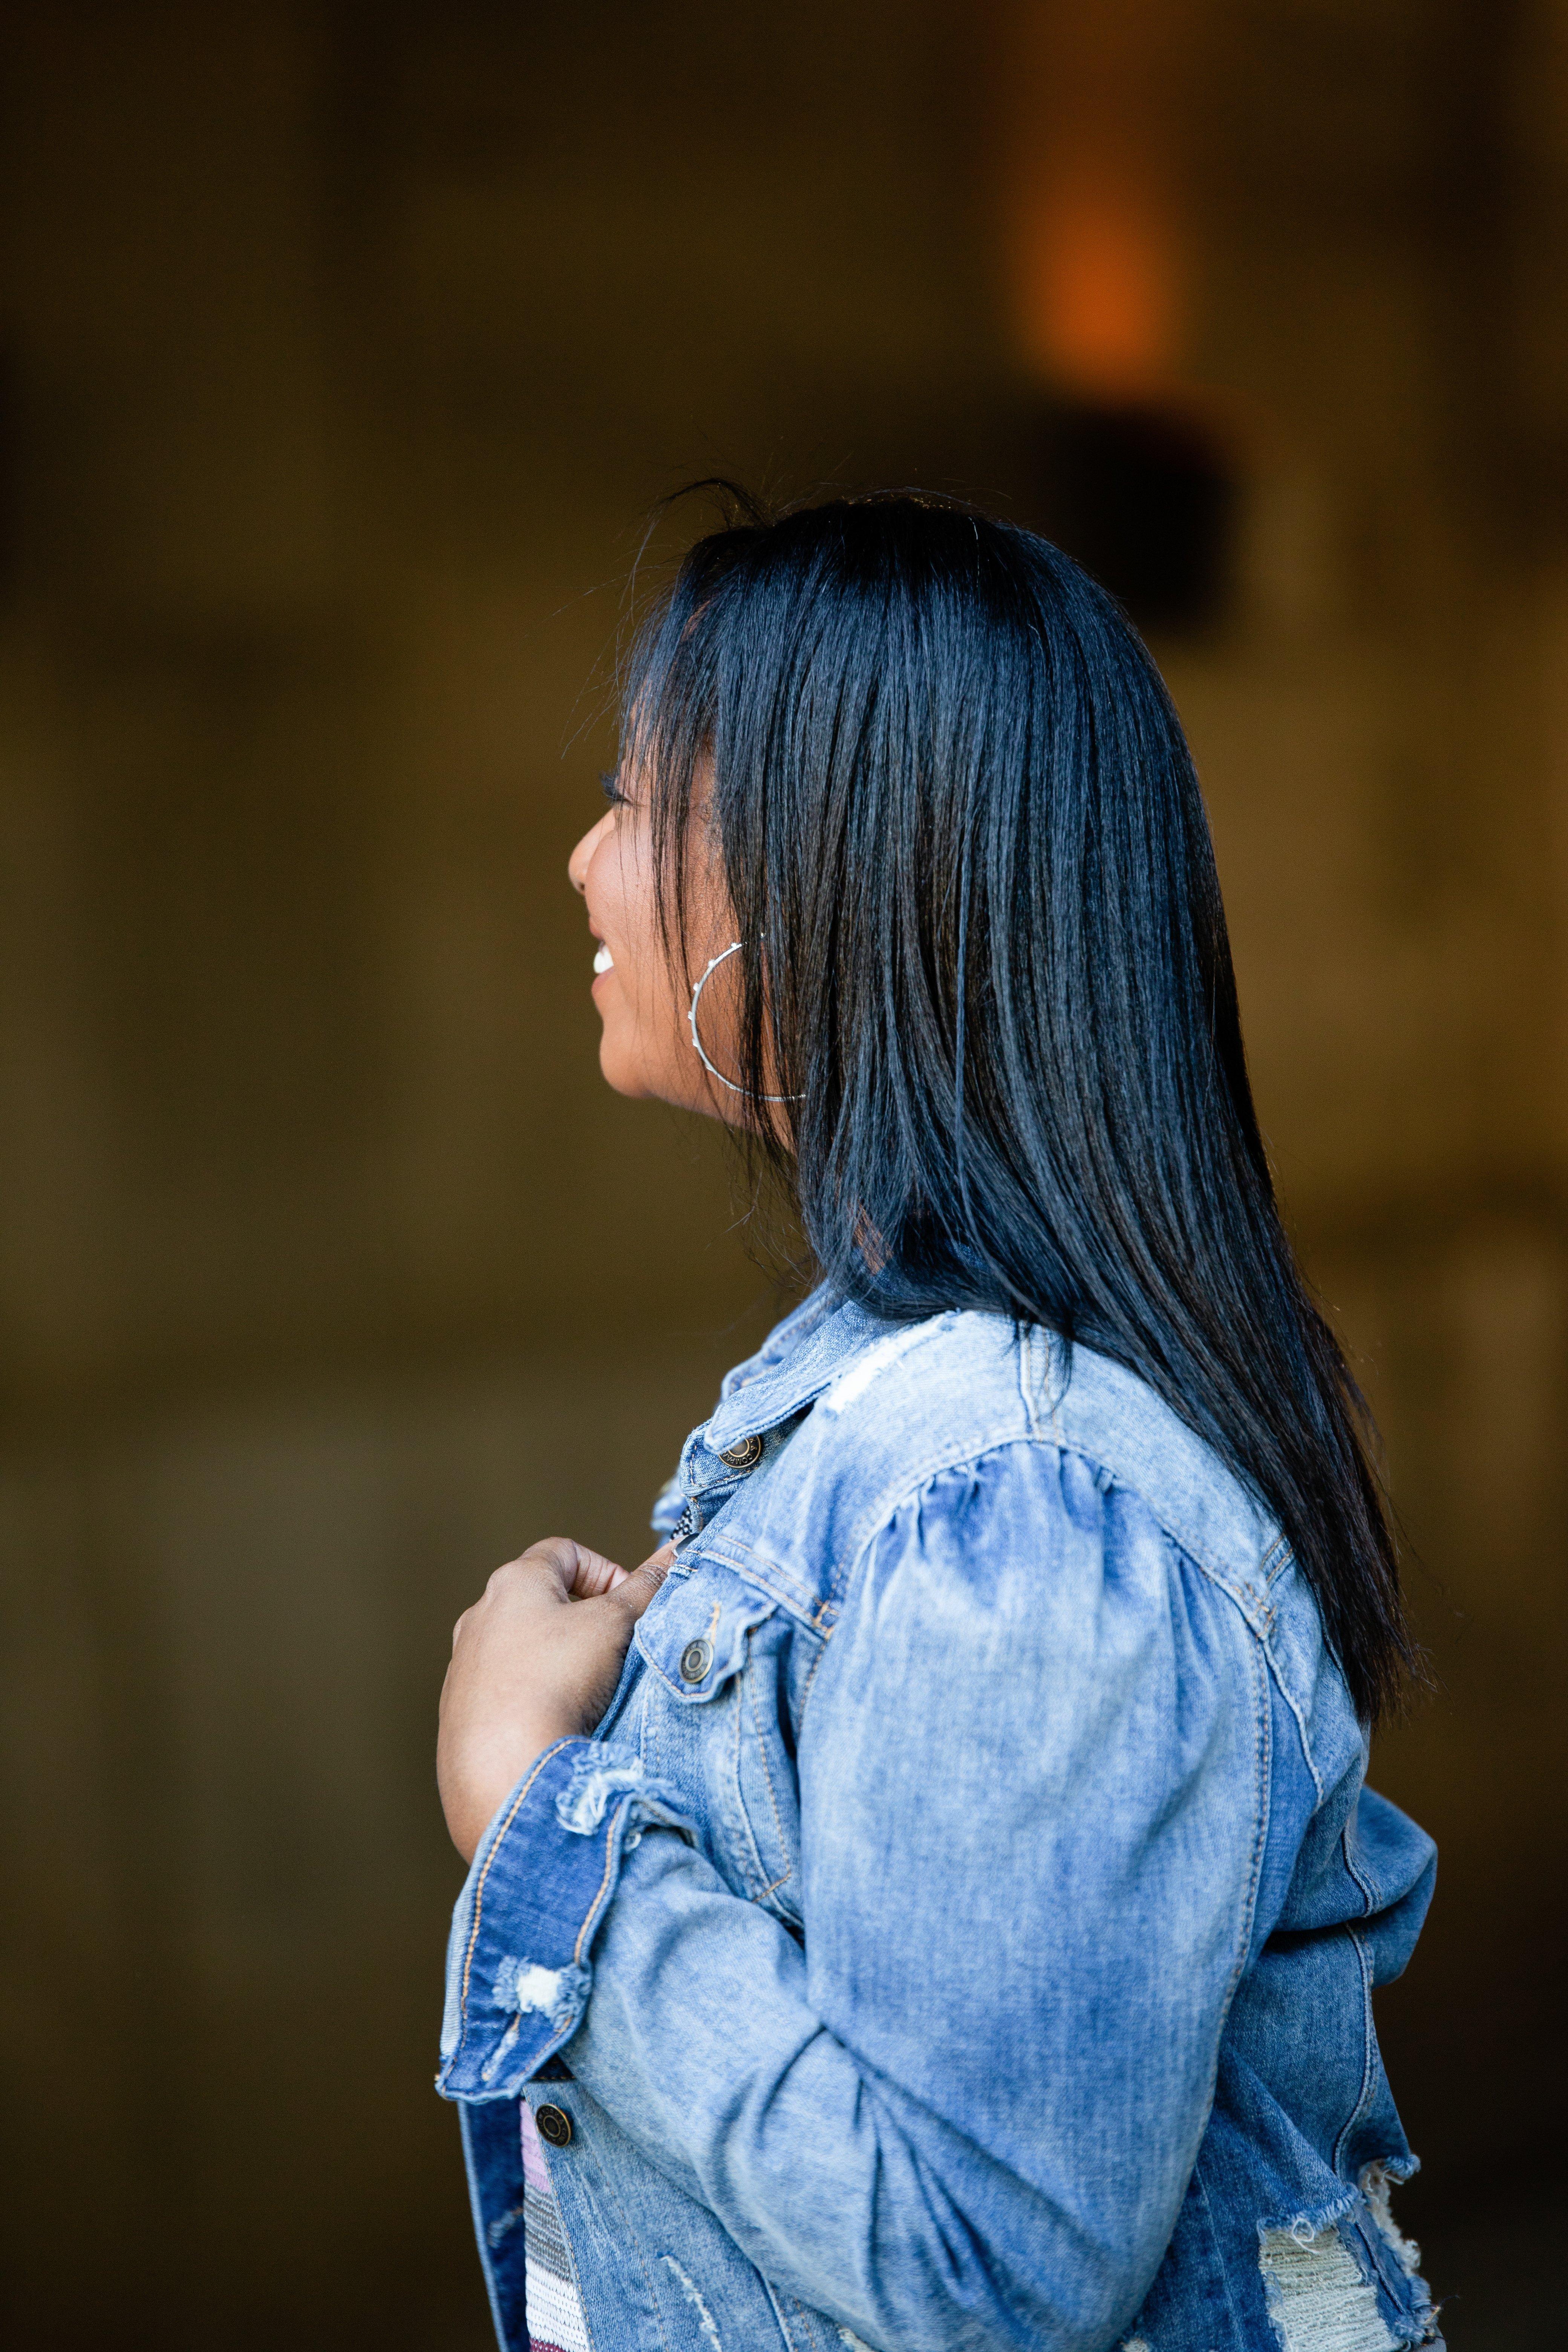 hair repair and reconstruction